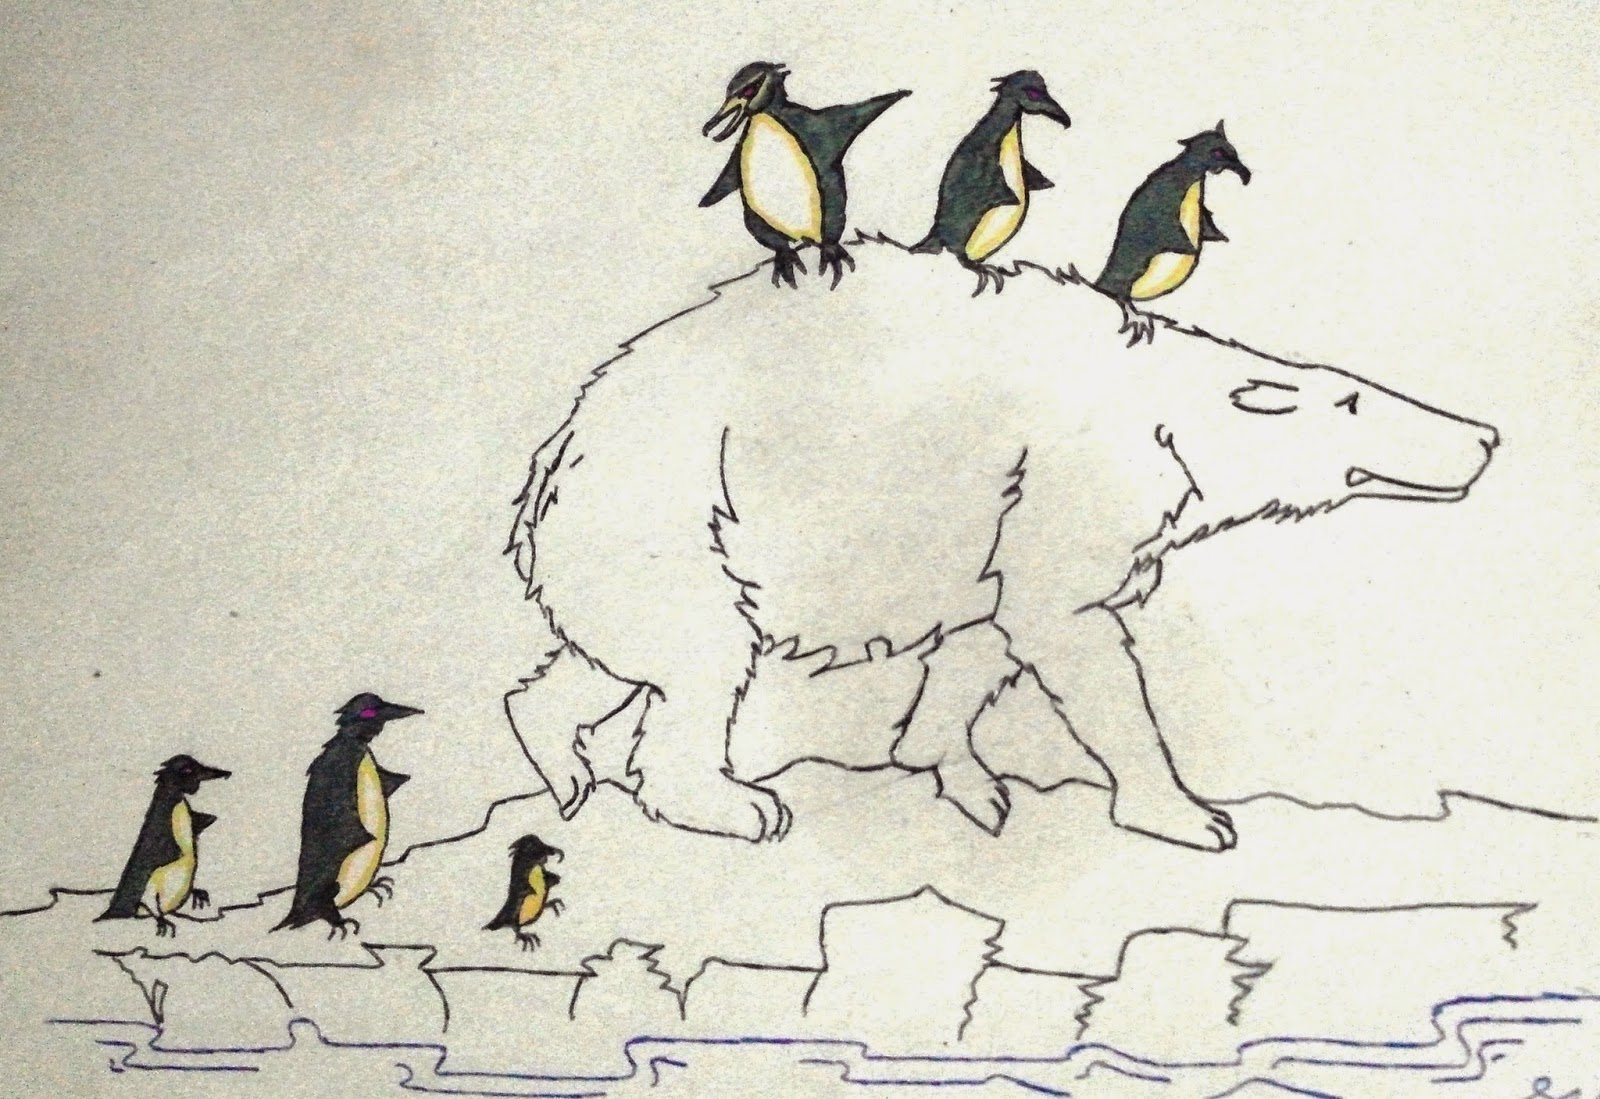 Ignite Dreams : Sketch of Global Warming Meltdown